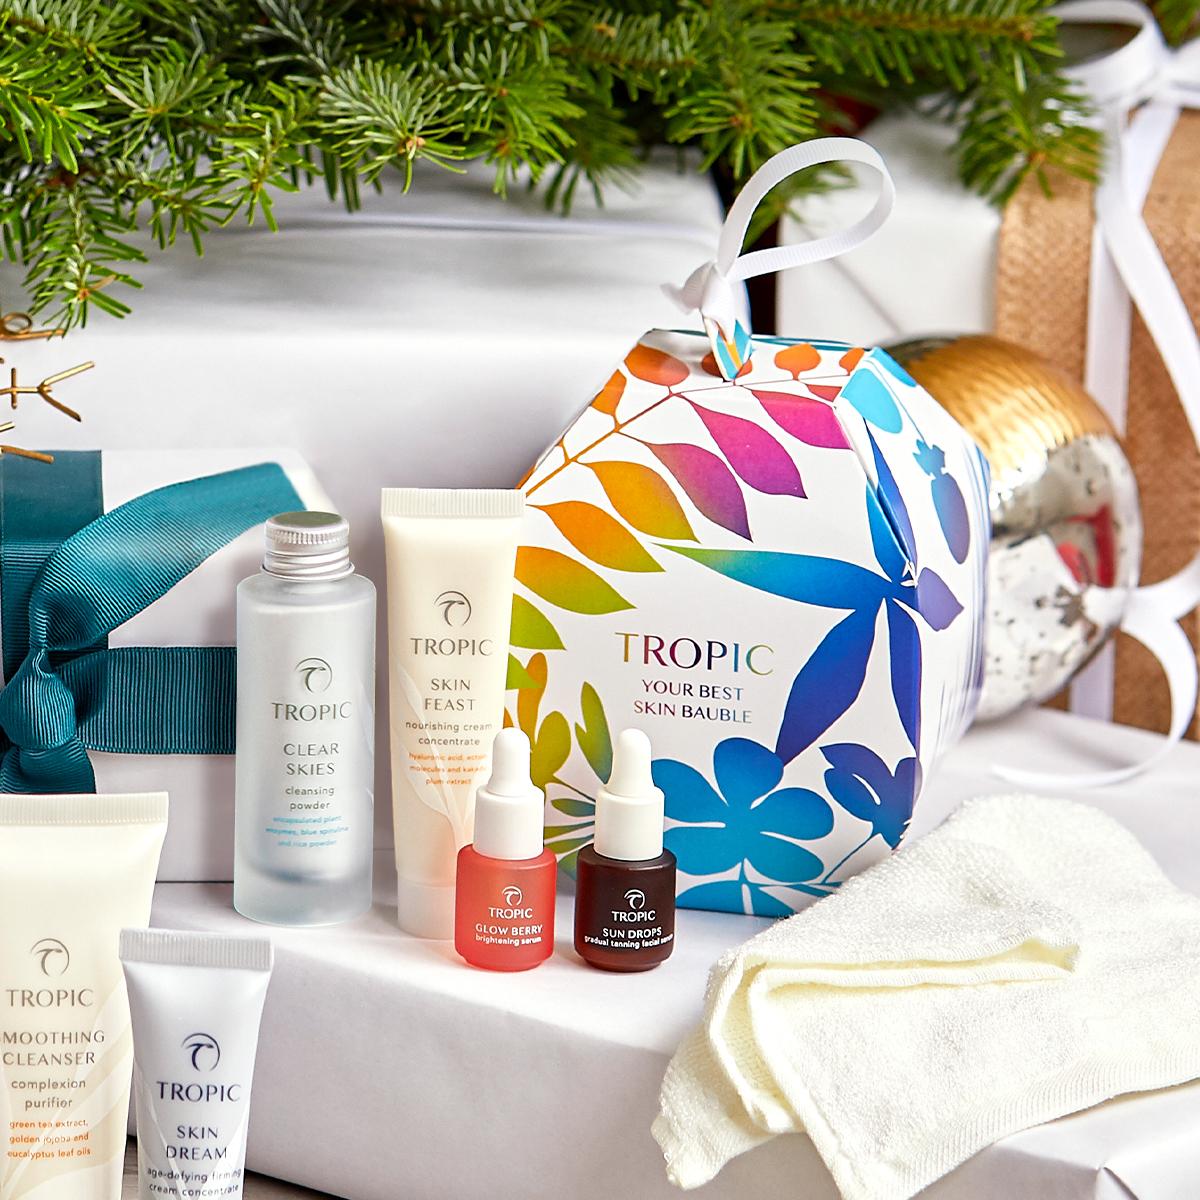 Glowing Skin Christmas gift